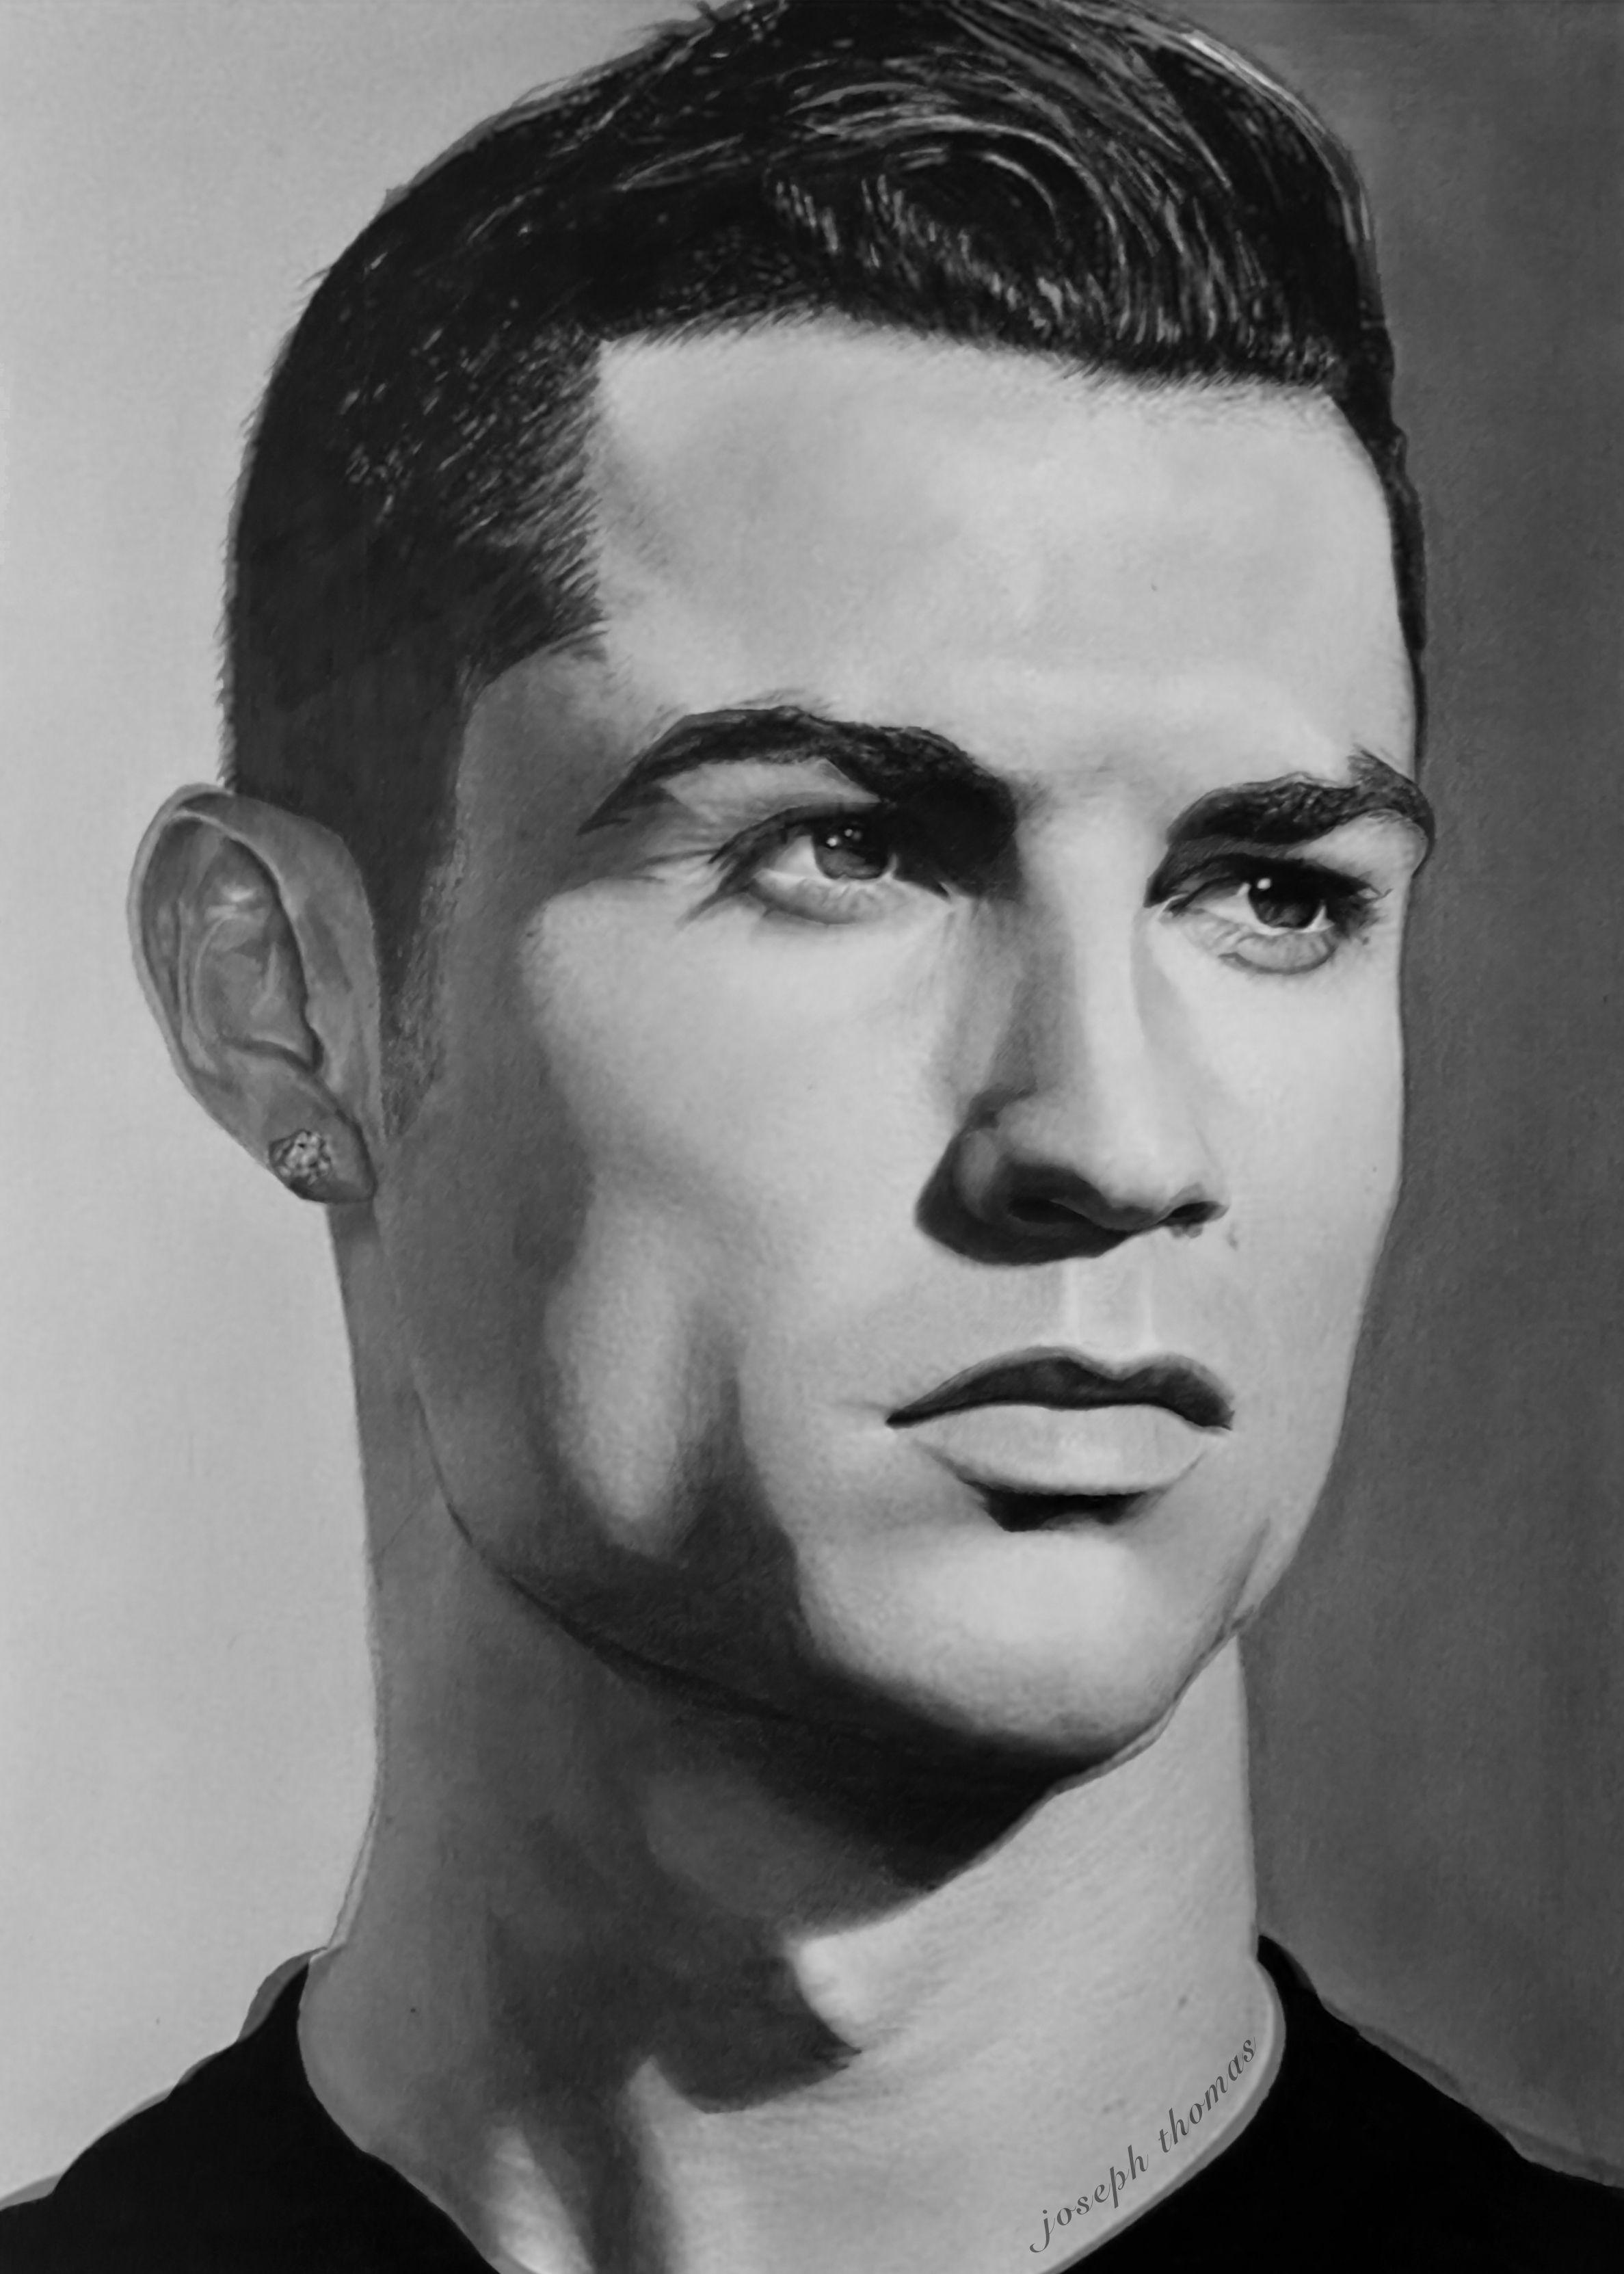 Cristiano Ronaldo Pencil Drawing Ronaldo Wallpapers Cristiano Ronaldo Wallpapers Pencil Drawings